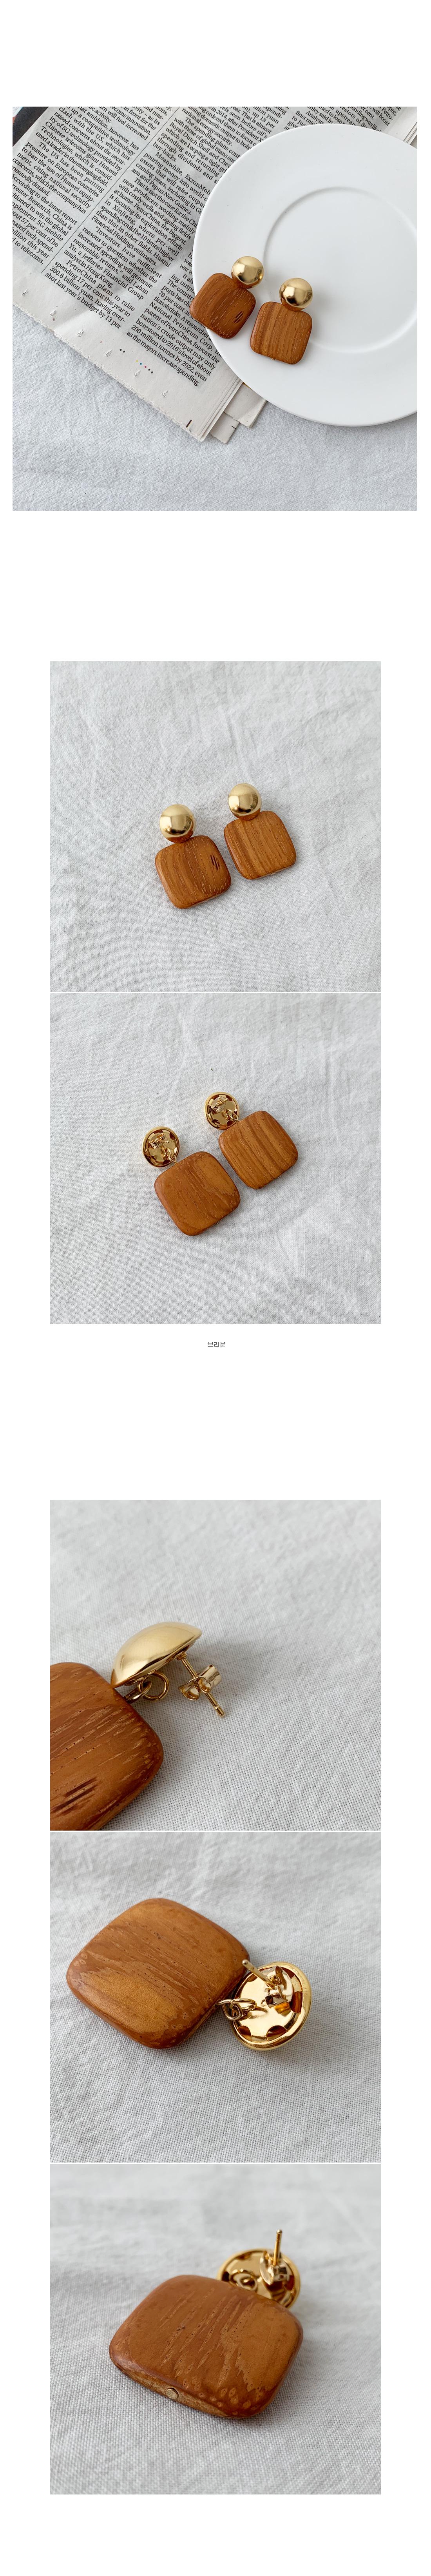 Square Wood Earrings